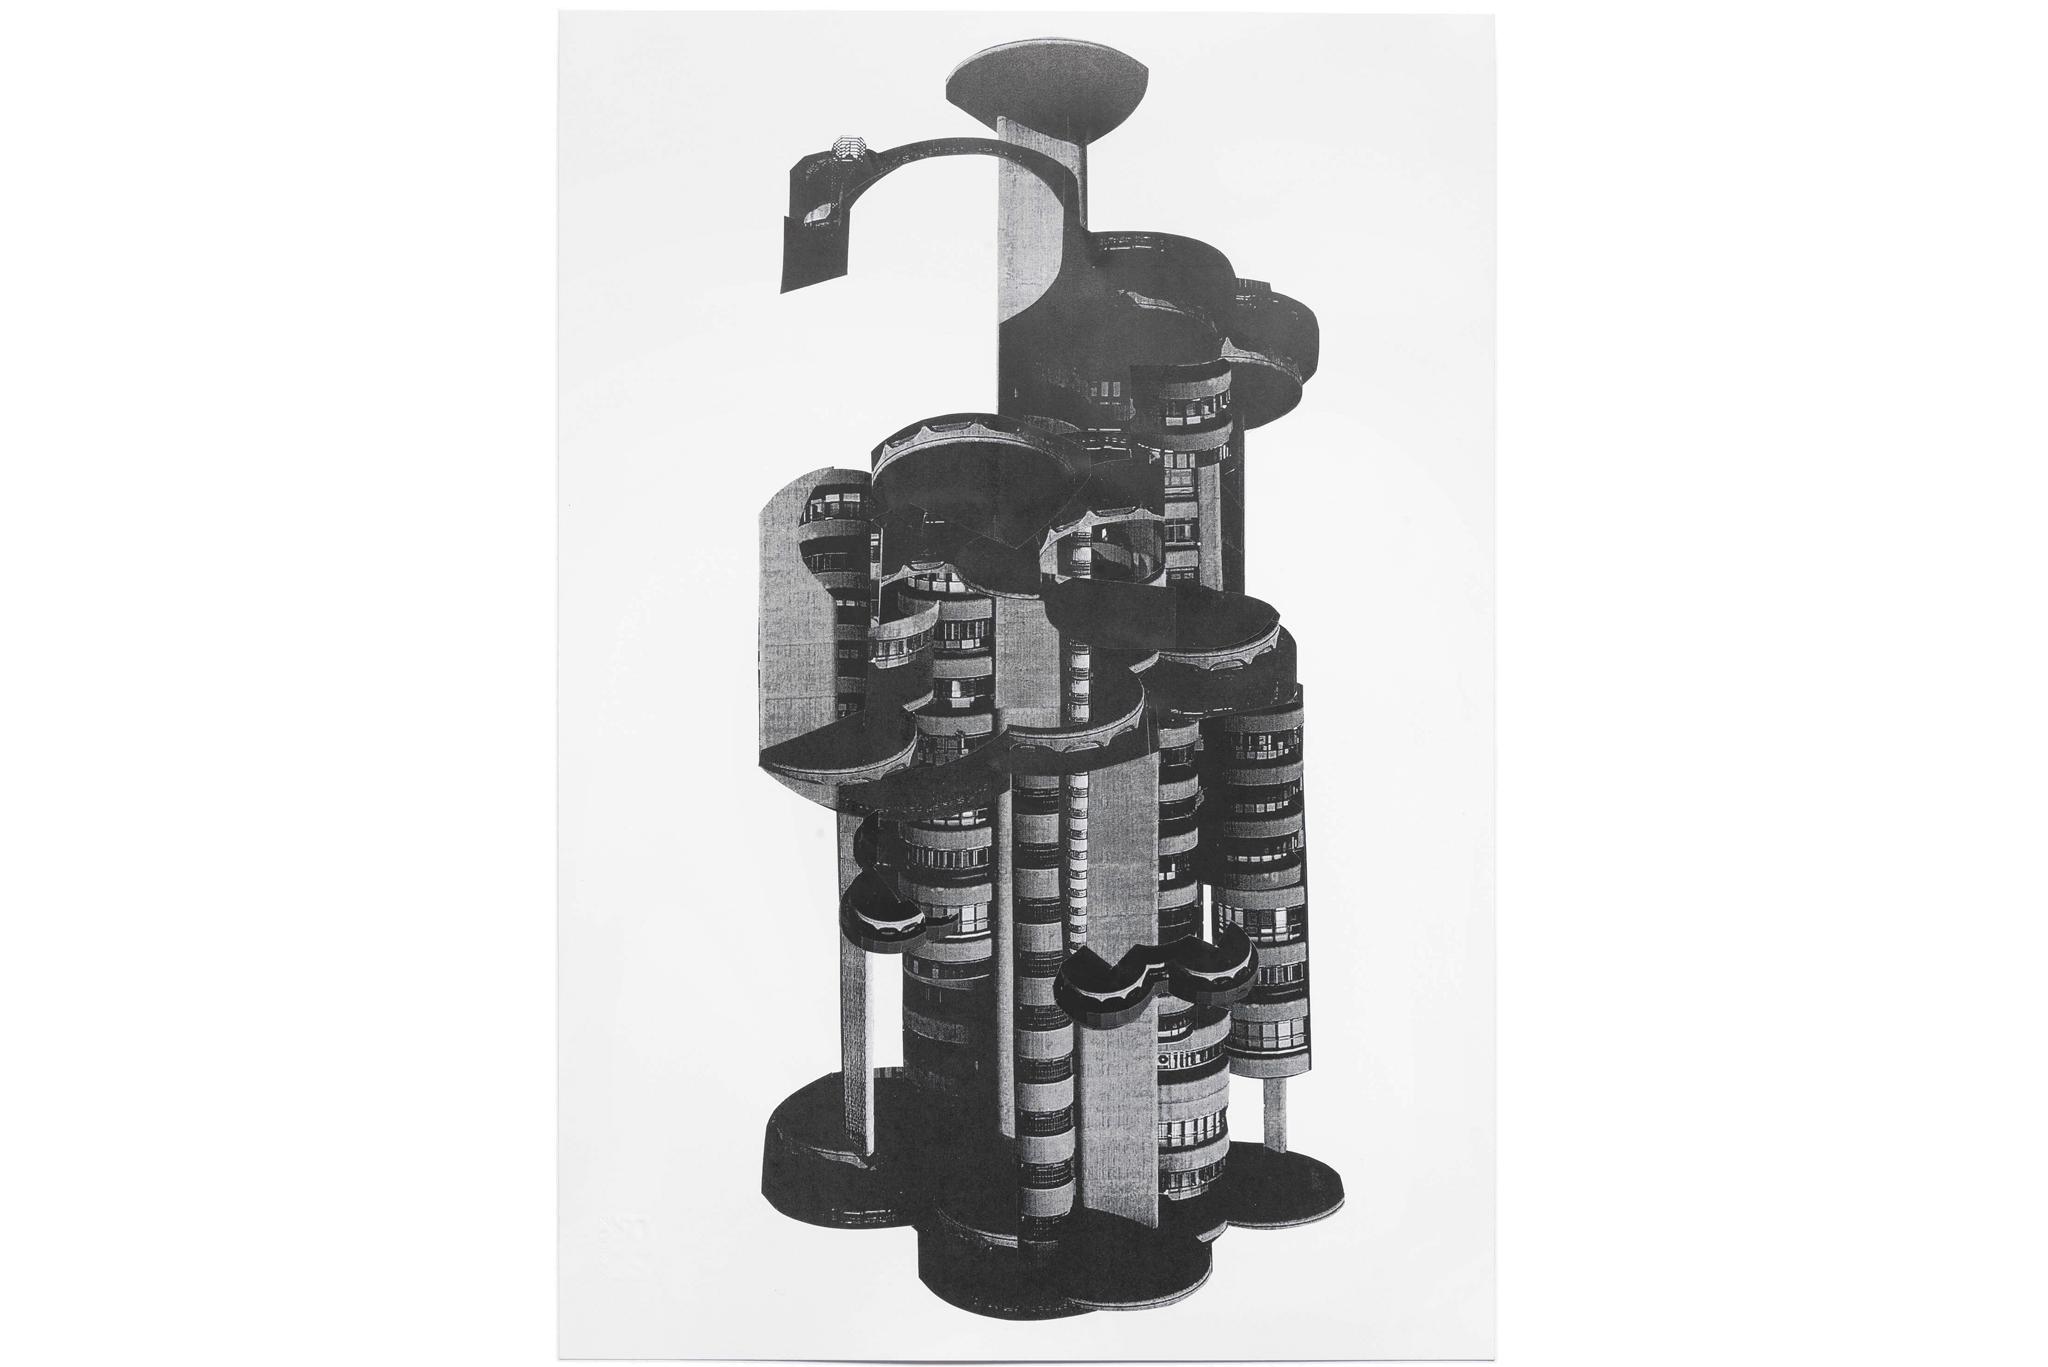 2014_23_Frauke-Dannert_Collage_Papiercollage_Kopf-Kopie